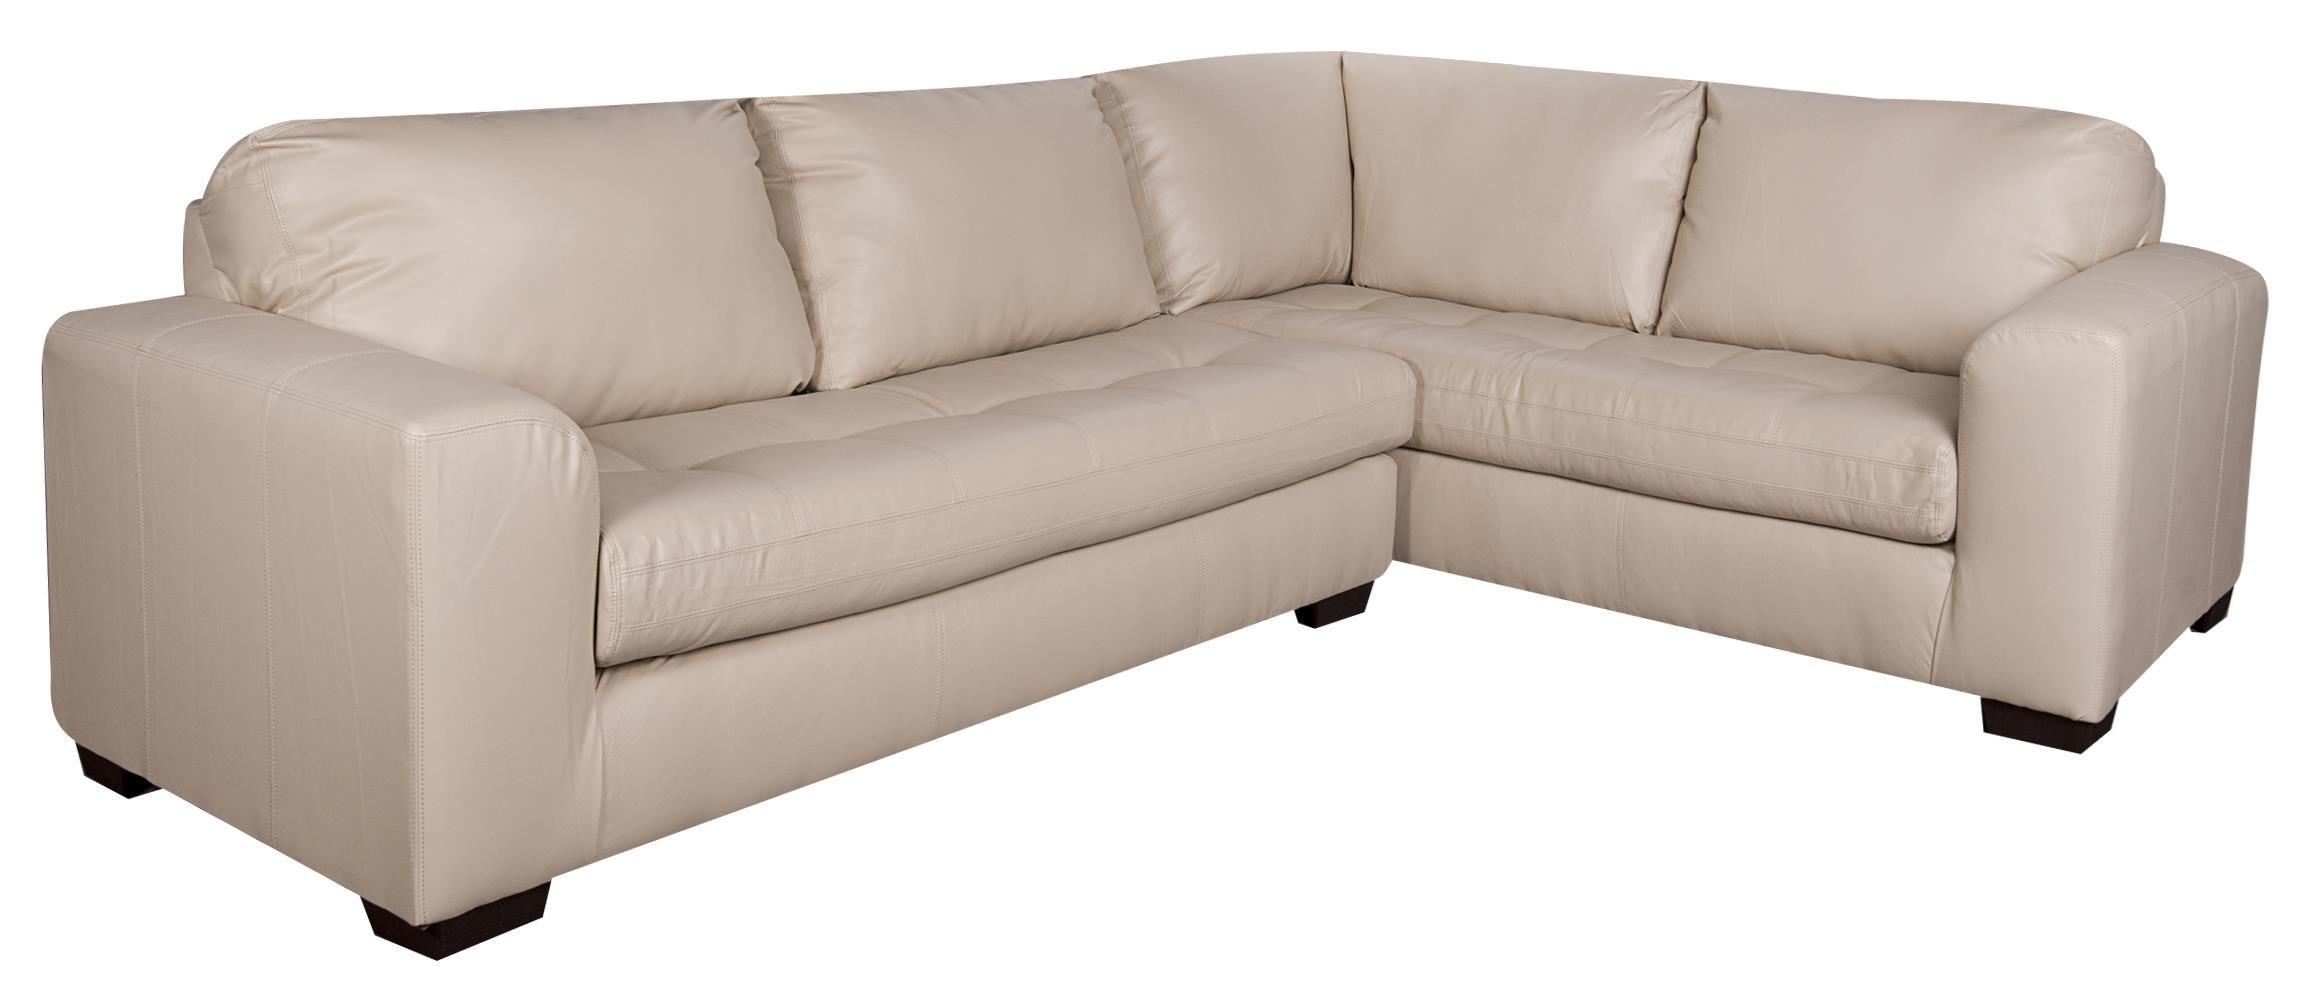 Morris Home Furnishings Arlo Arlo 2-Piece Sectional - Item Number: 996174453